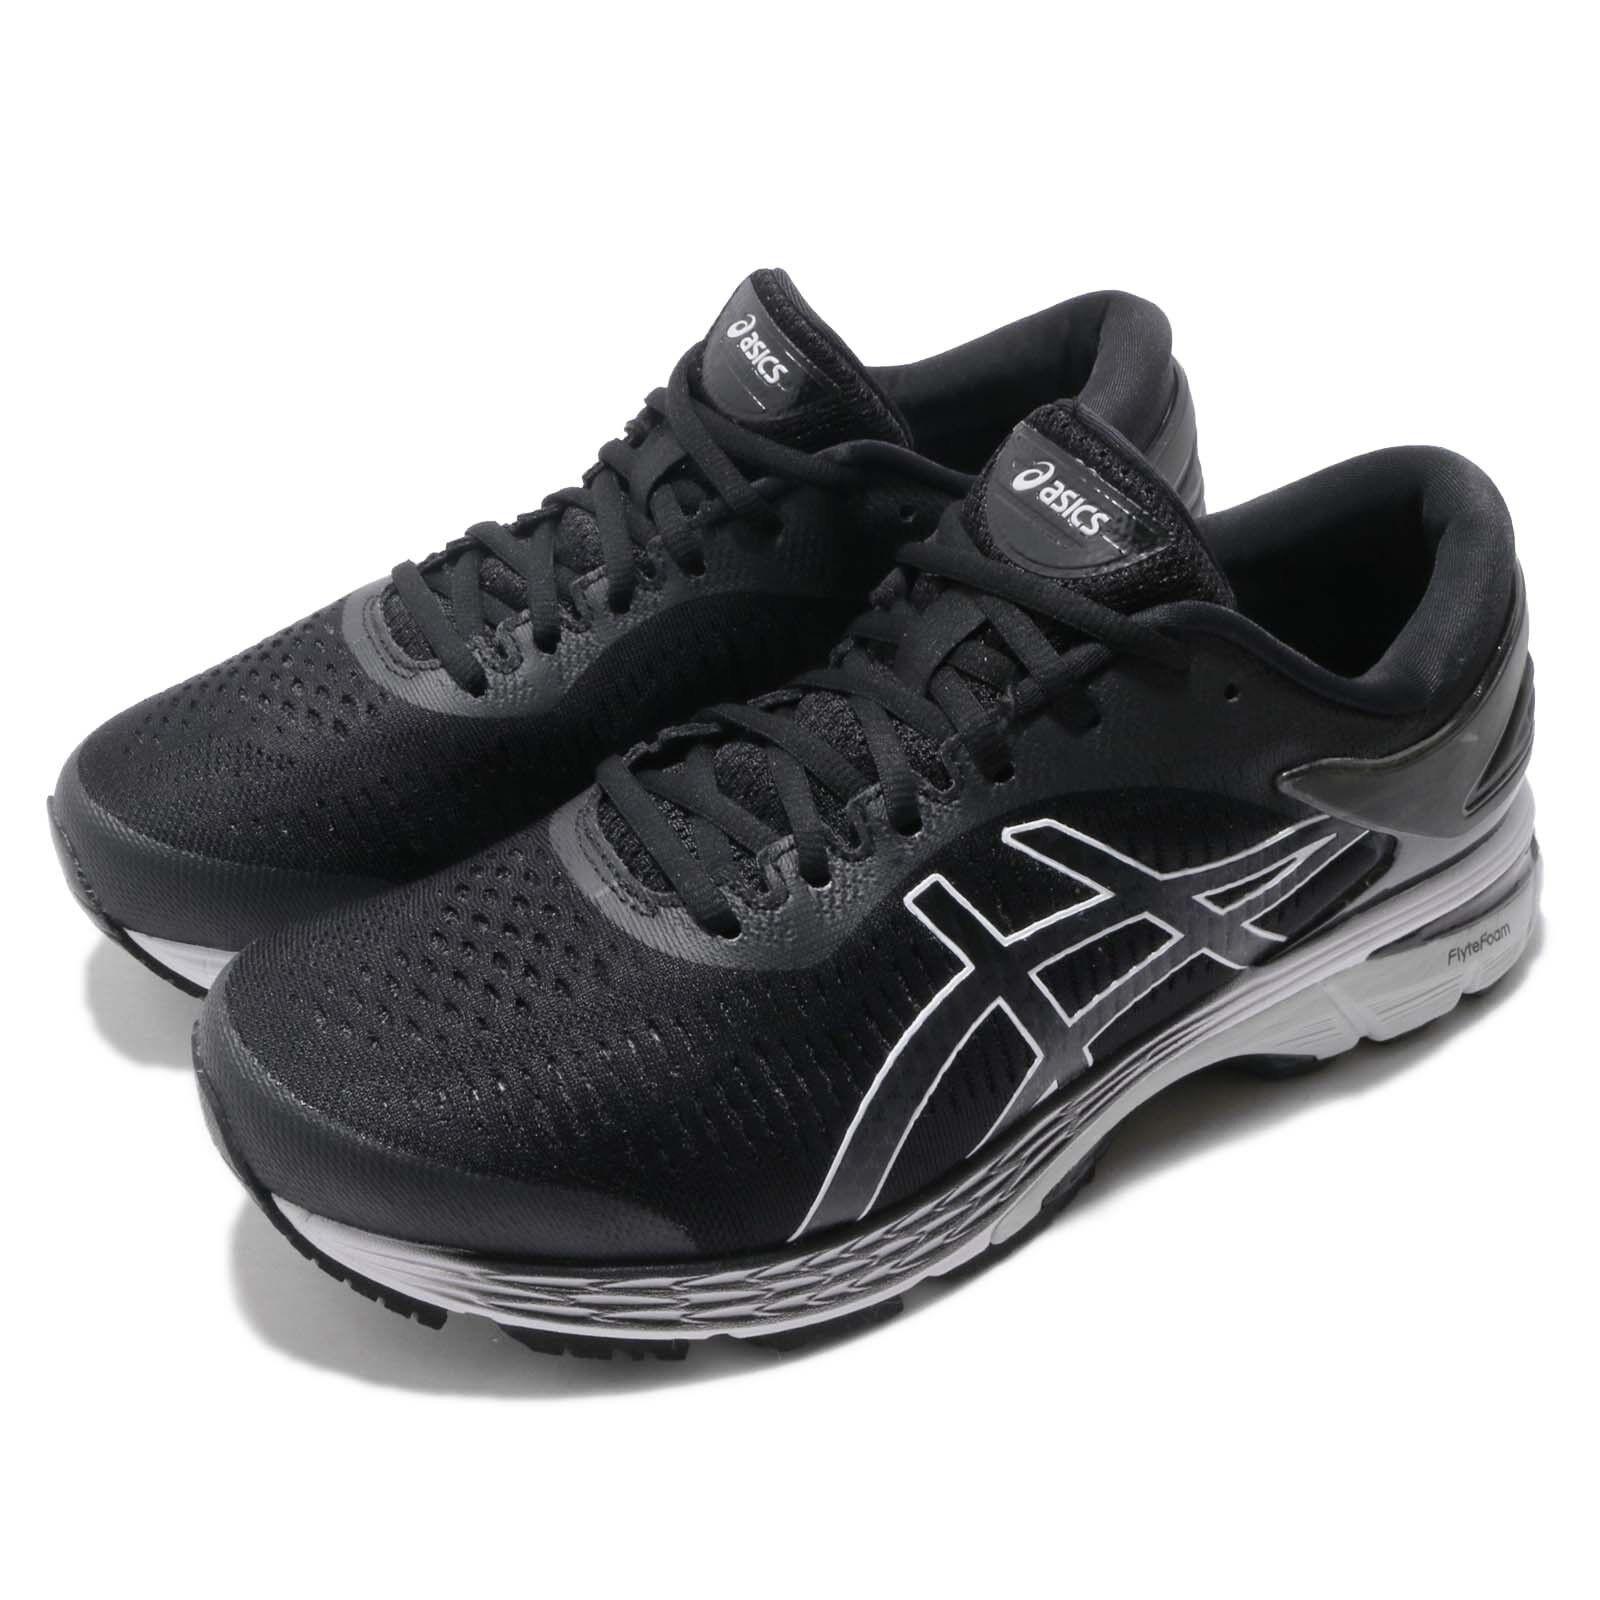 Asics Gel Kayano 25 2E Wide Black Grey Men Running shoes Sneakers 1011A029-003